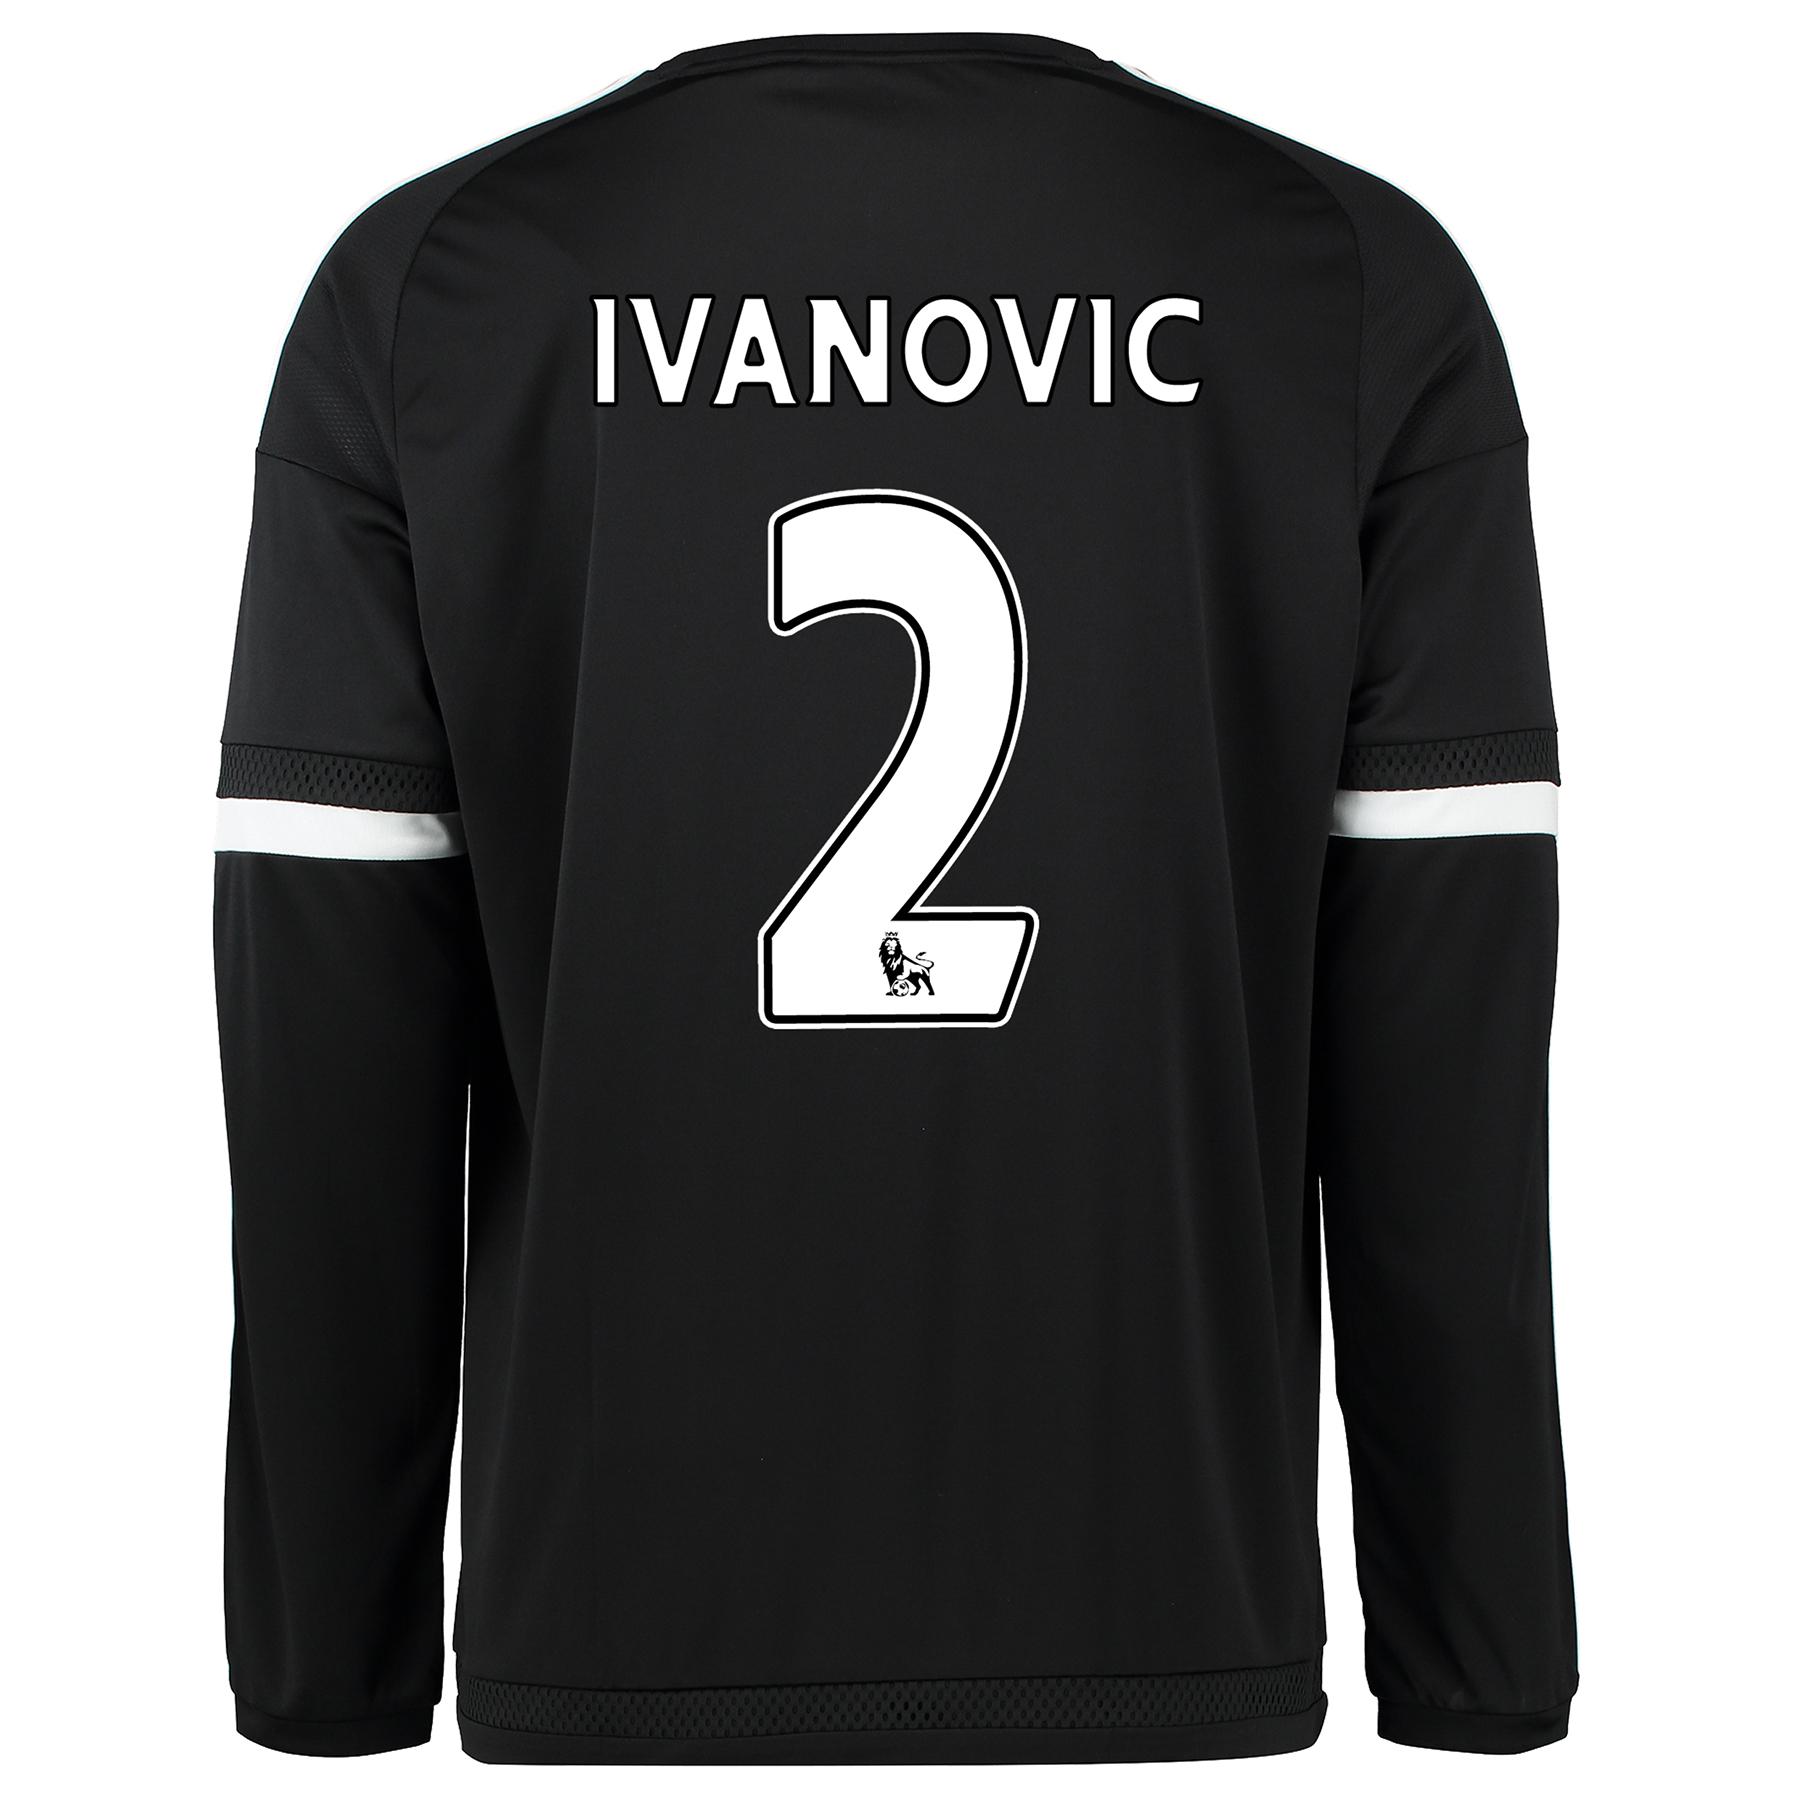 Chelsea Third Shirt 2015/16 - Long Sleeve Black with Ivanovic 2 printi